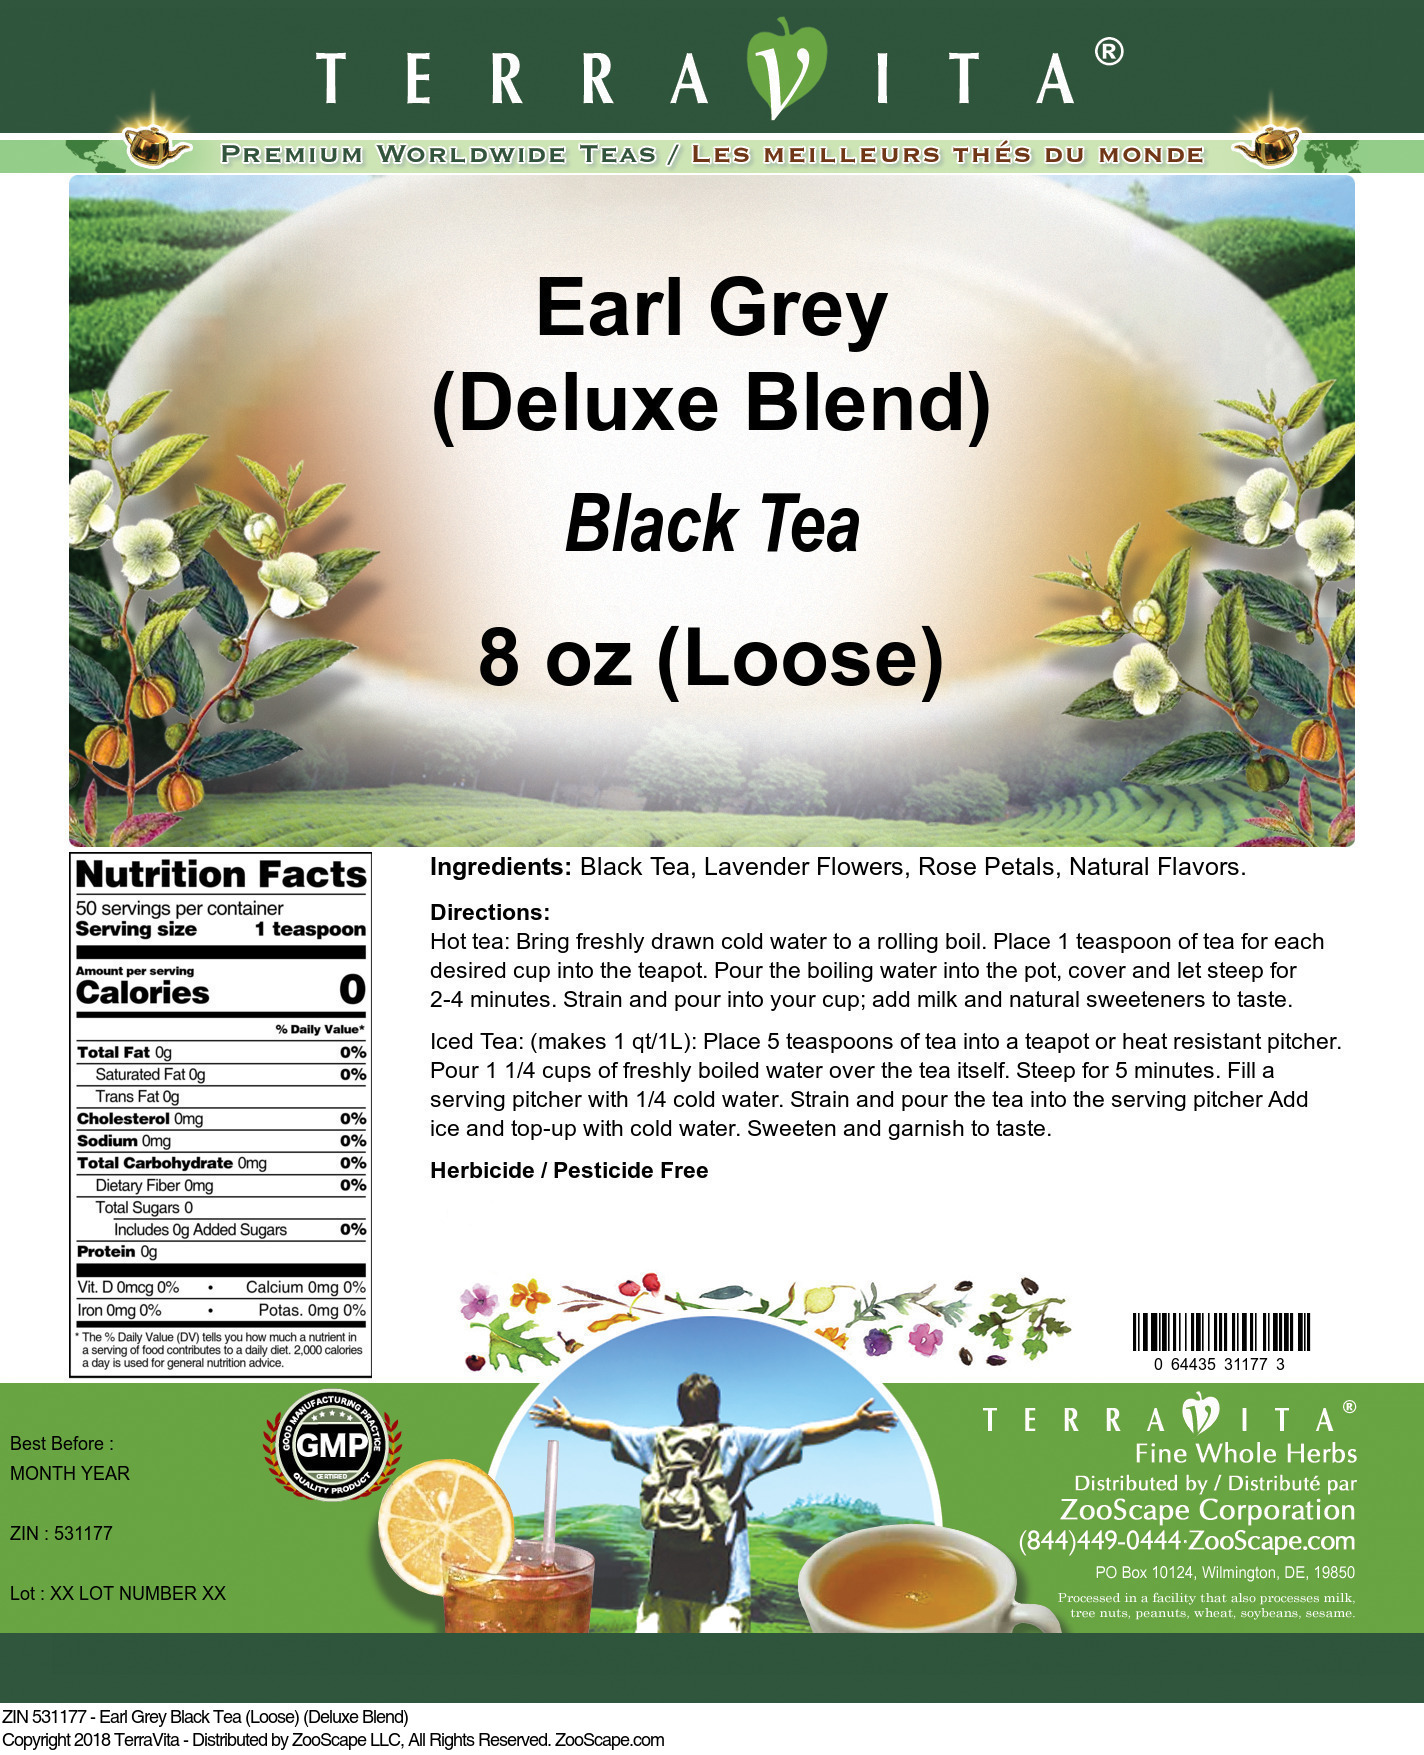 Earl Grey Black Tea (Loose) (Deluxe Blend)